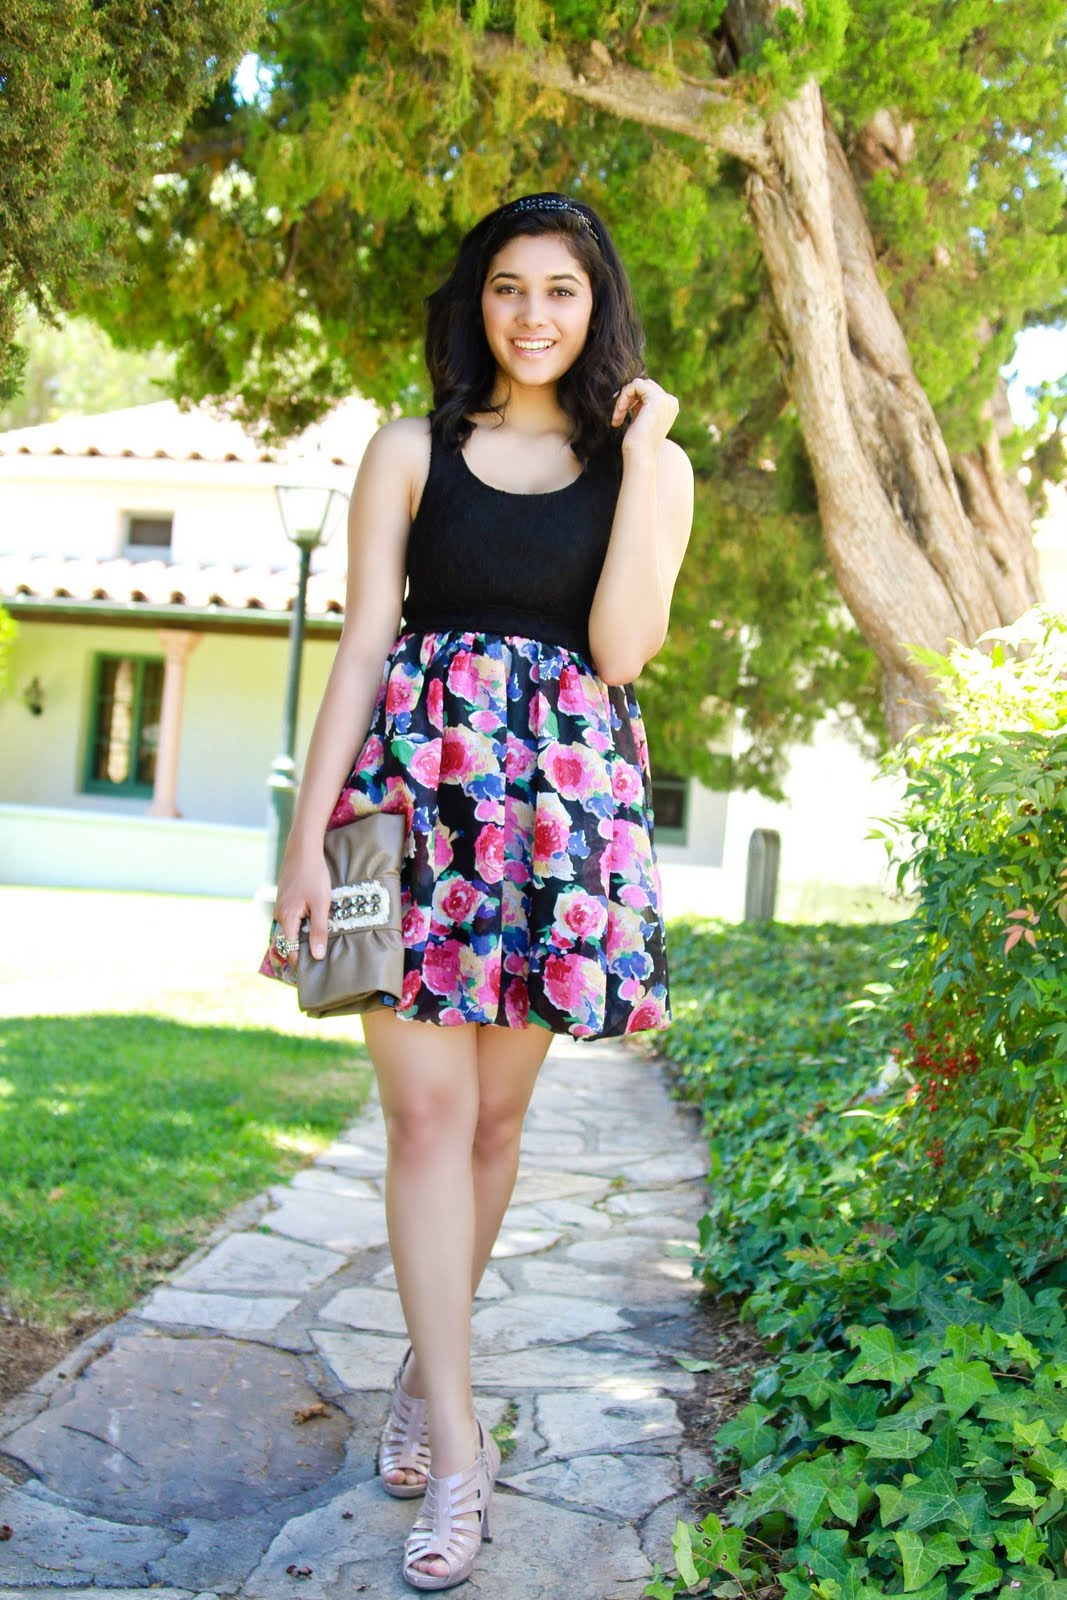 Teen Modeling Portfolio: Home